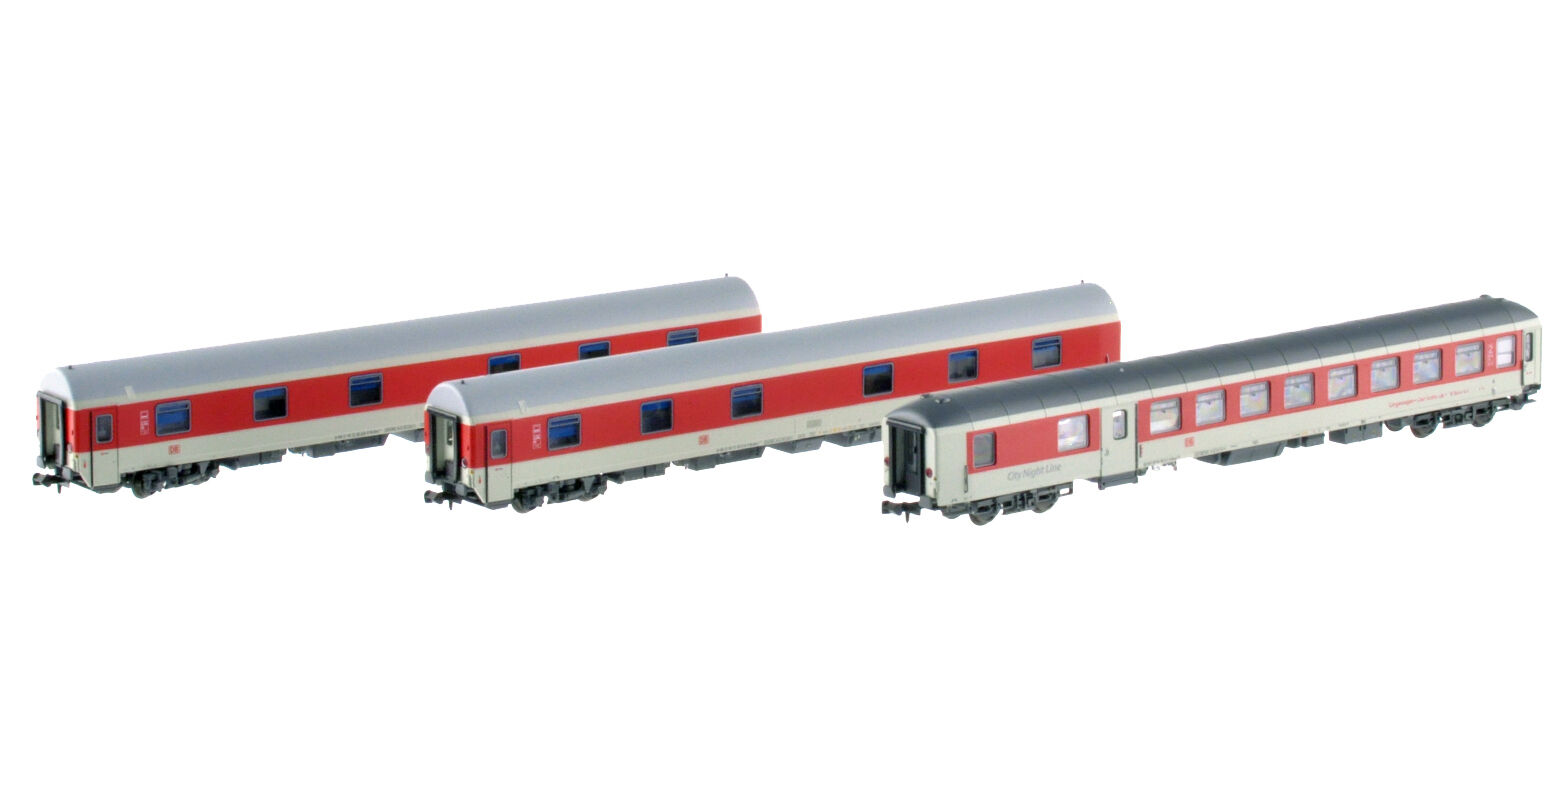 LS Models 79055 CNL DB Set PEGASUS 1xLiege+2xSchlafWag 1xLiege+2xSchlafWag 1xLiege+2xSchlafWag lichtgrey red Ep6 Neu+OVP 1f9f1a